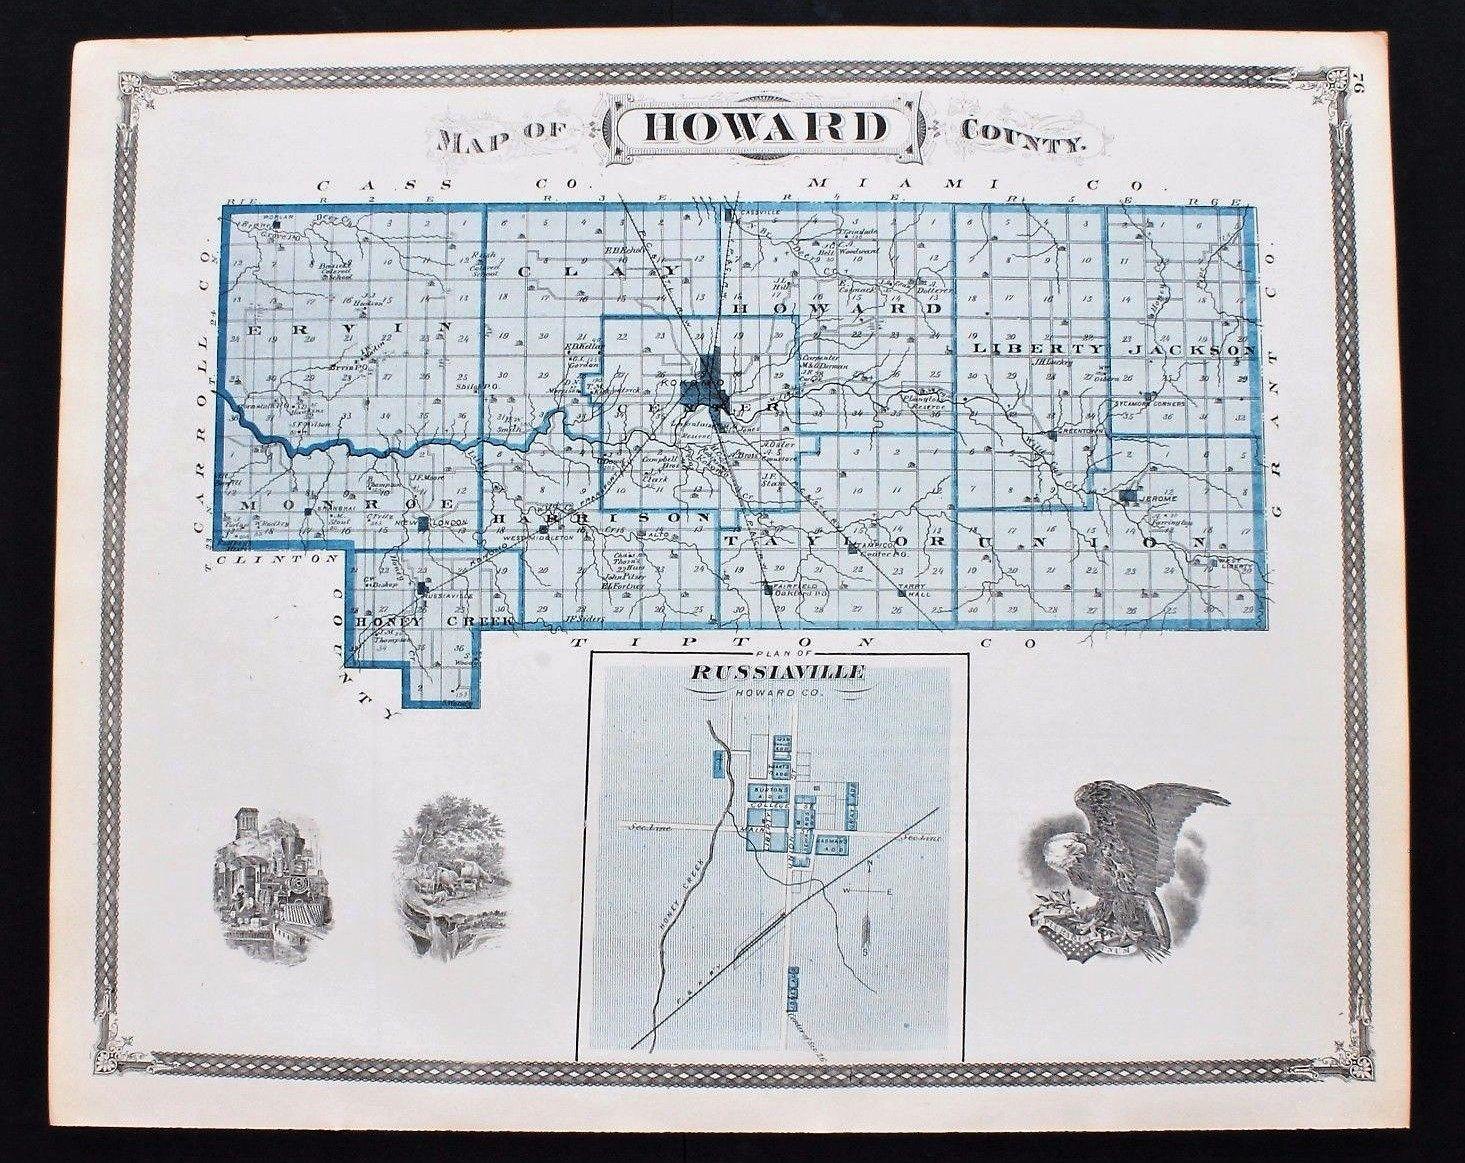 1876 Howard County Indiana Map Kokomo Jerome Russianville Railroads on prescott arizona map, pinal county arizona map, sonora and arizona map, city of phoenix arizona map, state of arizona county map, cochise county arizona map, mingus mountain arizona map, arizona large color map, coconino county arizona map, mohave county arizona map, arizona county lines map, flagstaff arizona map, san juan county arizona map, mount baldy arizona map, apache county arizona map, gila county arizona map, navajo county arizona map, city of cottonwood arizona map, sun city arizona zip code map, black canyon city arizona map,